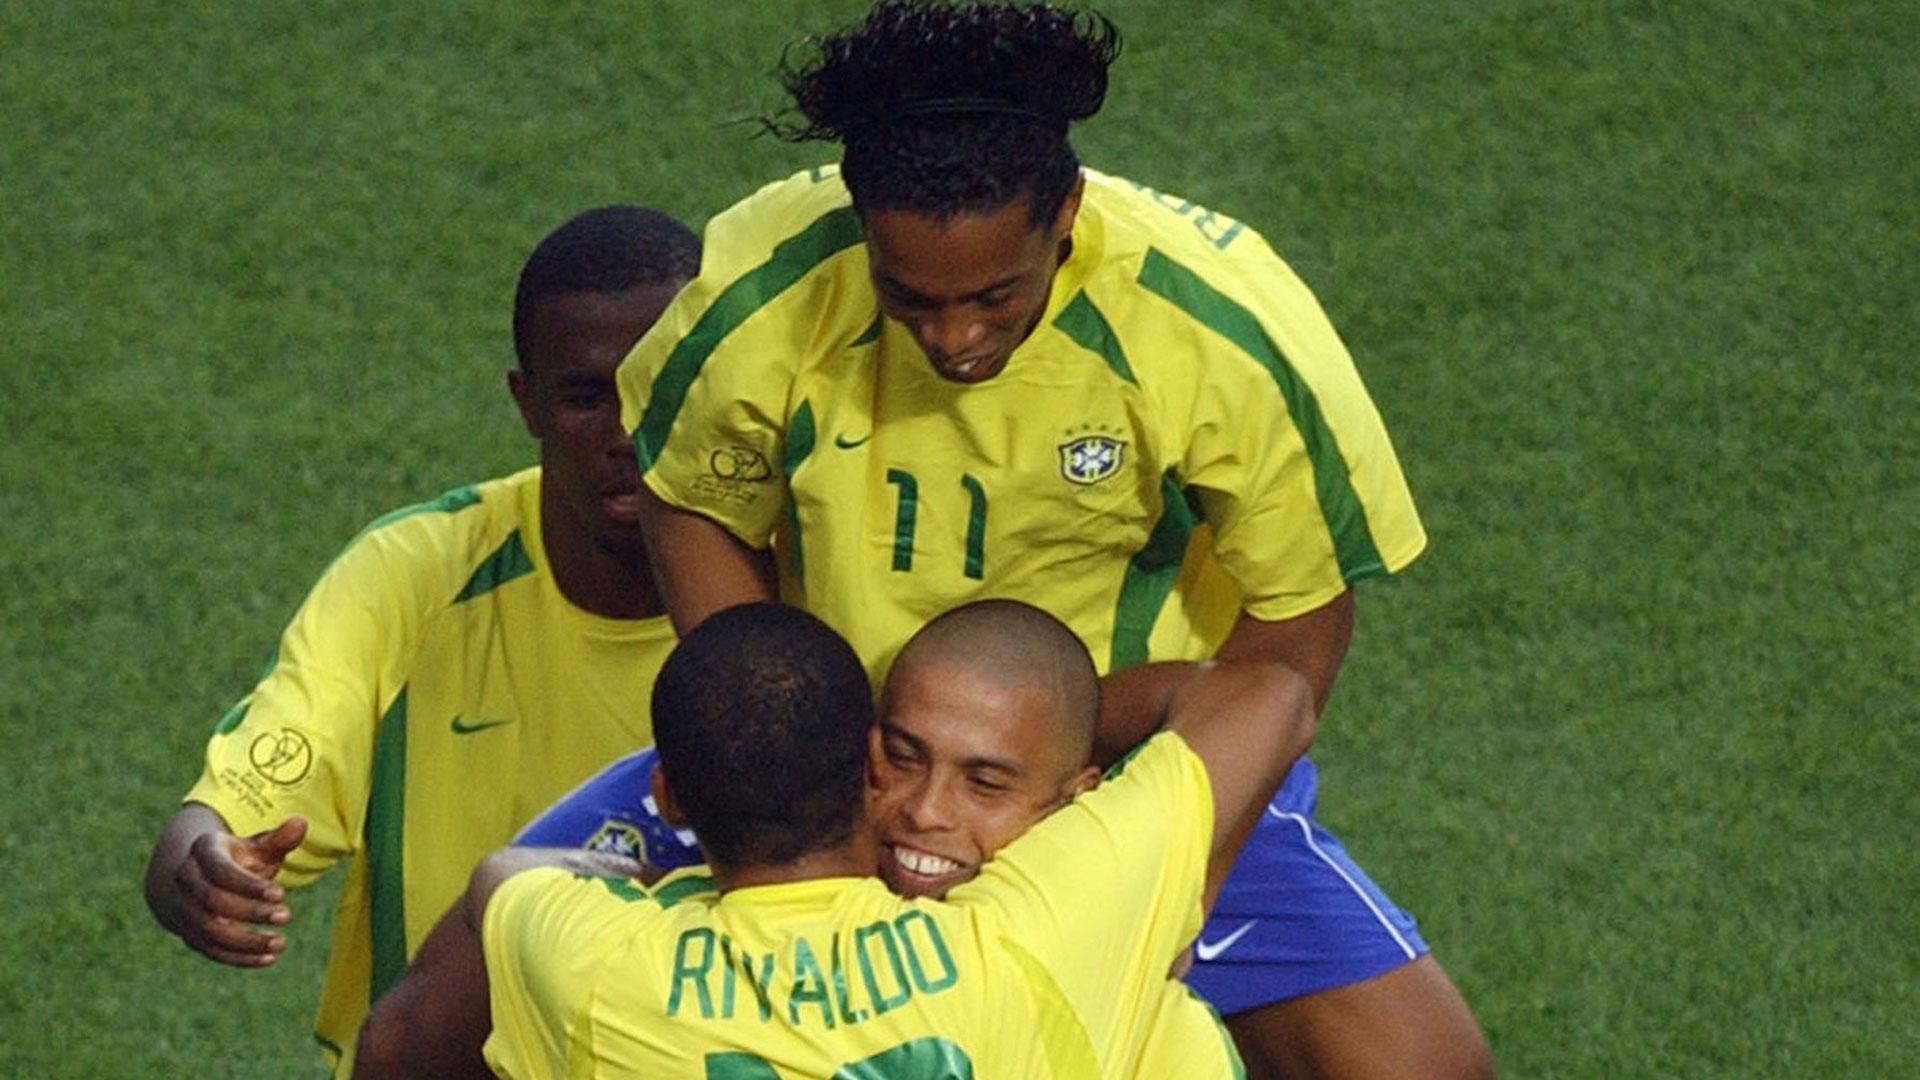 Ronaldo Rivaldo Ronaldinho Brazil 2002 World Cup Goal